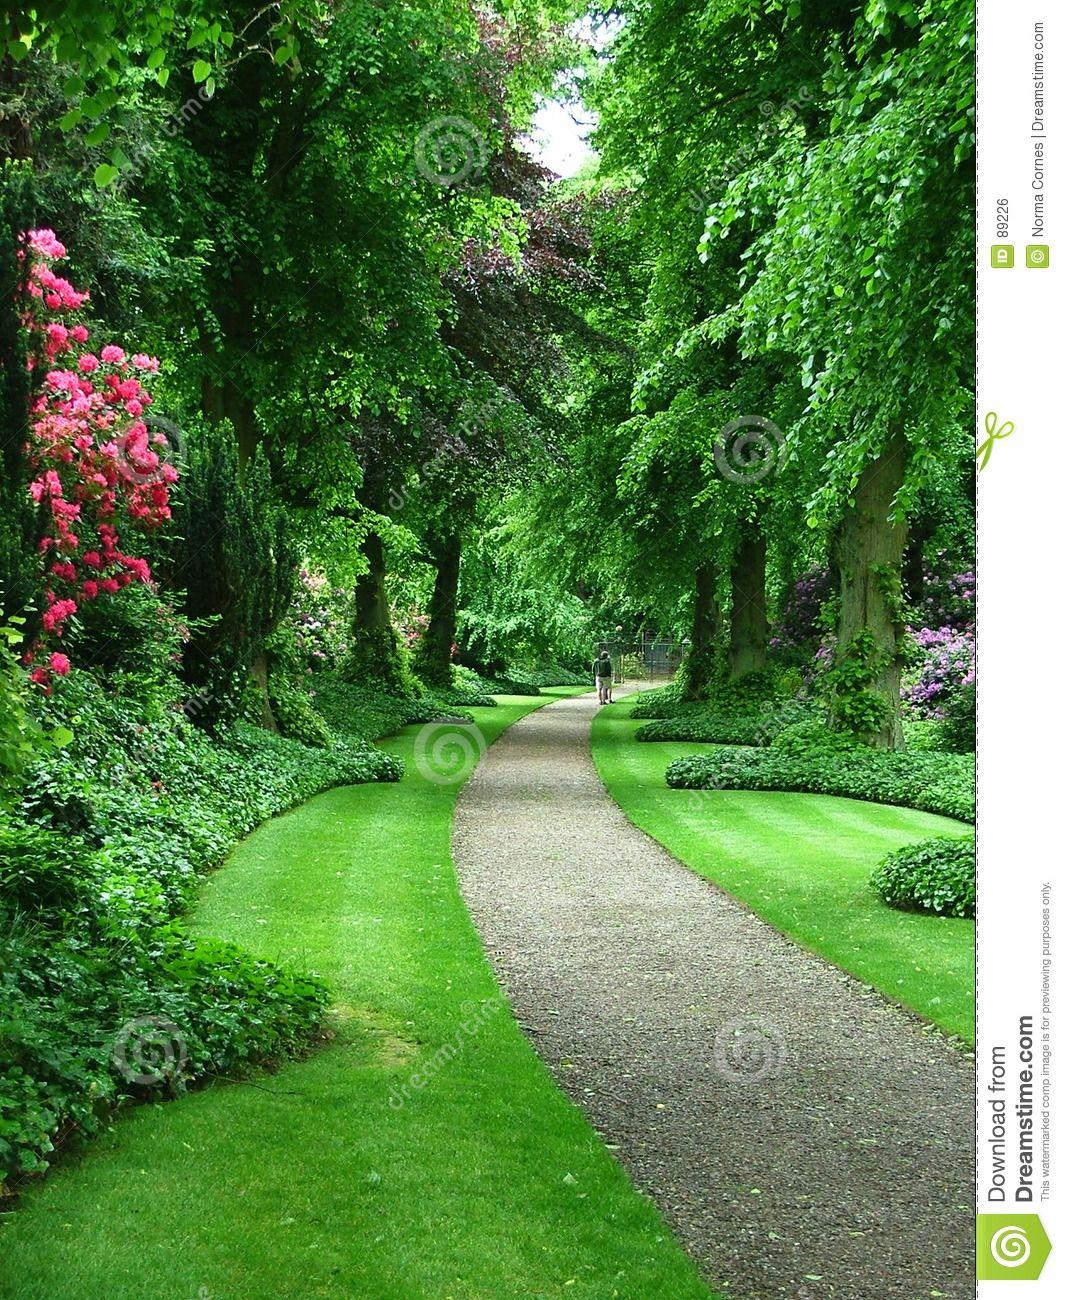 Garden Paths Gravel - Google Search